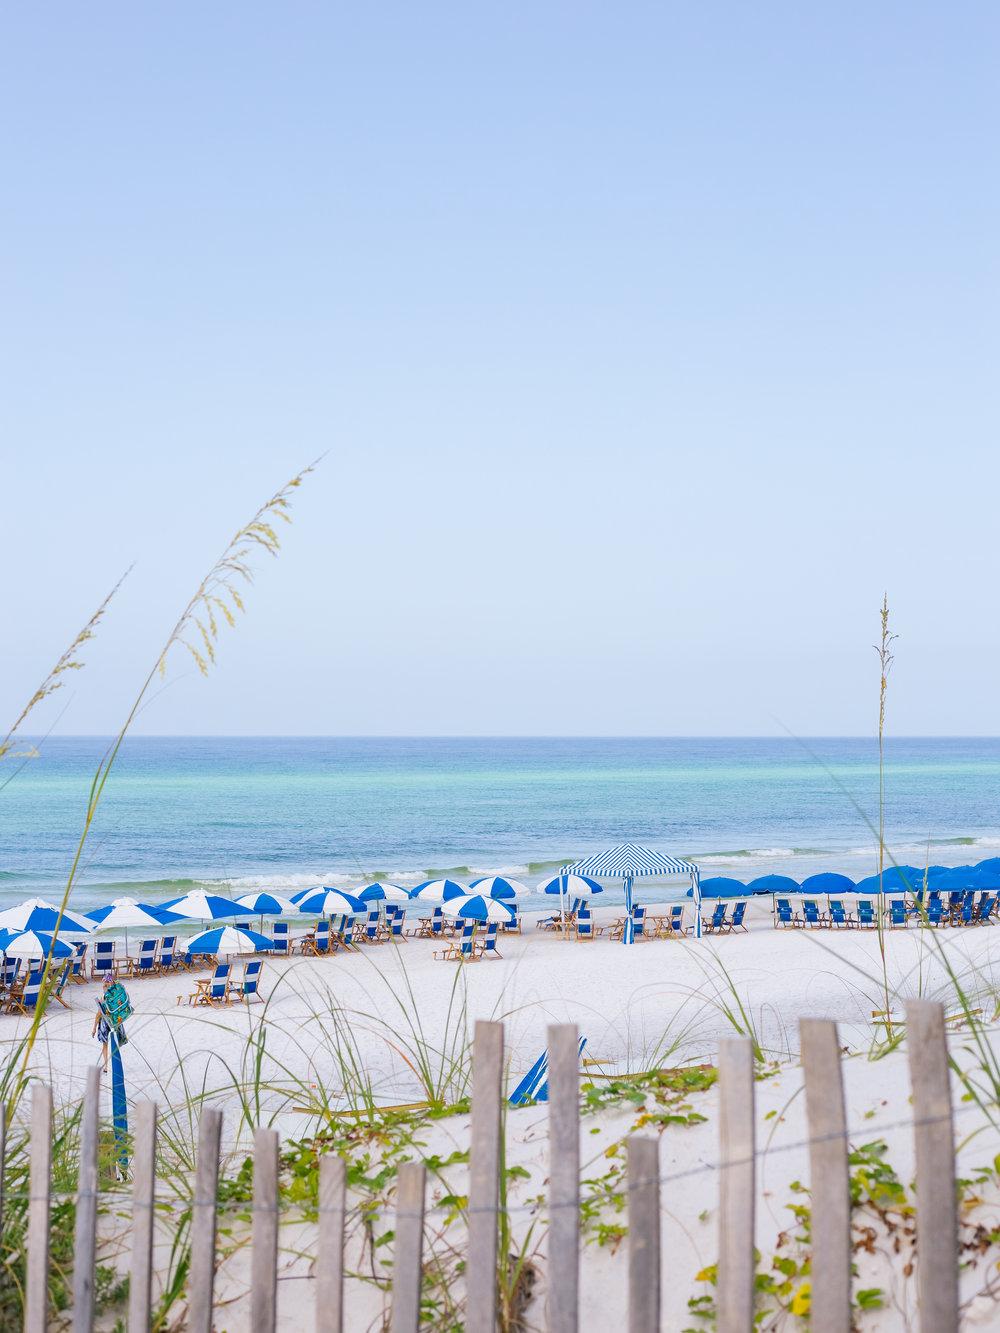 lcb style fashion blogger seaside florida beach fourth of july  (10 of 28).jpg